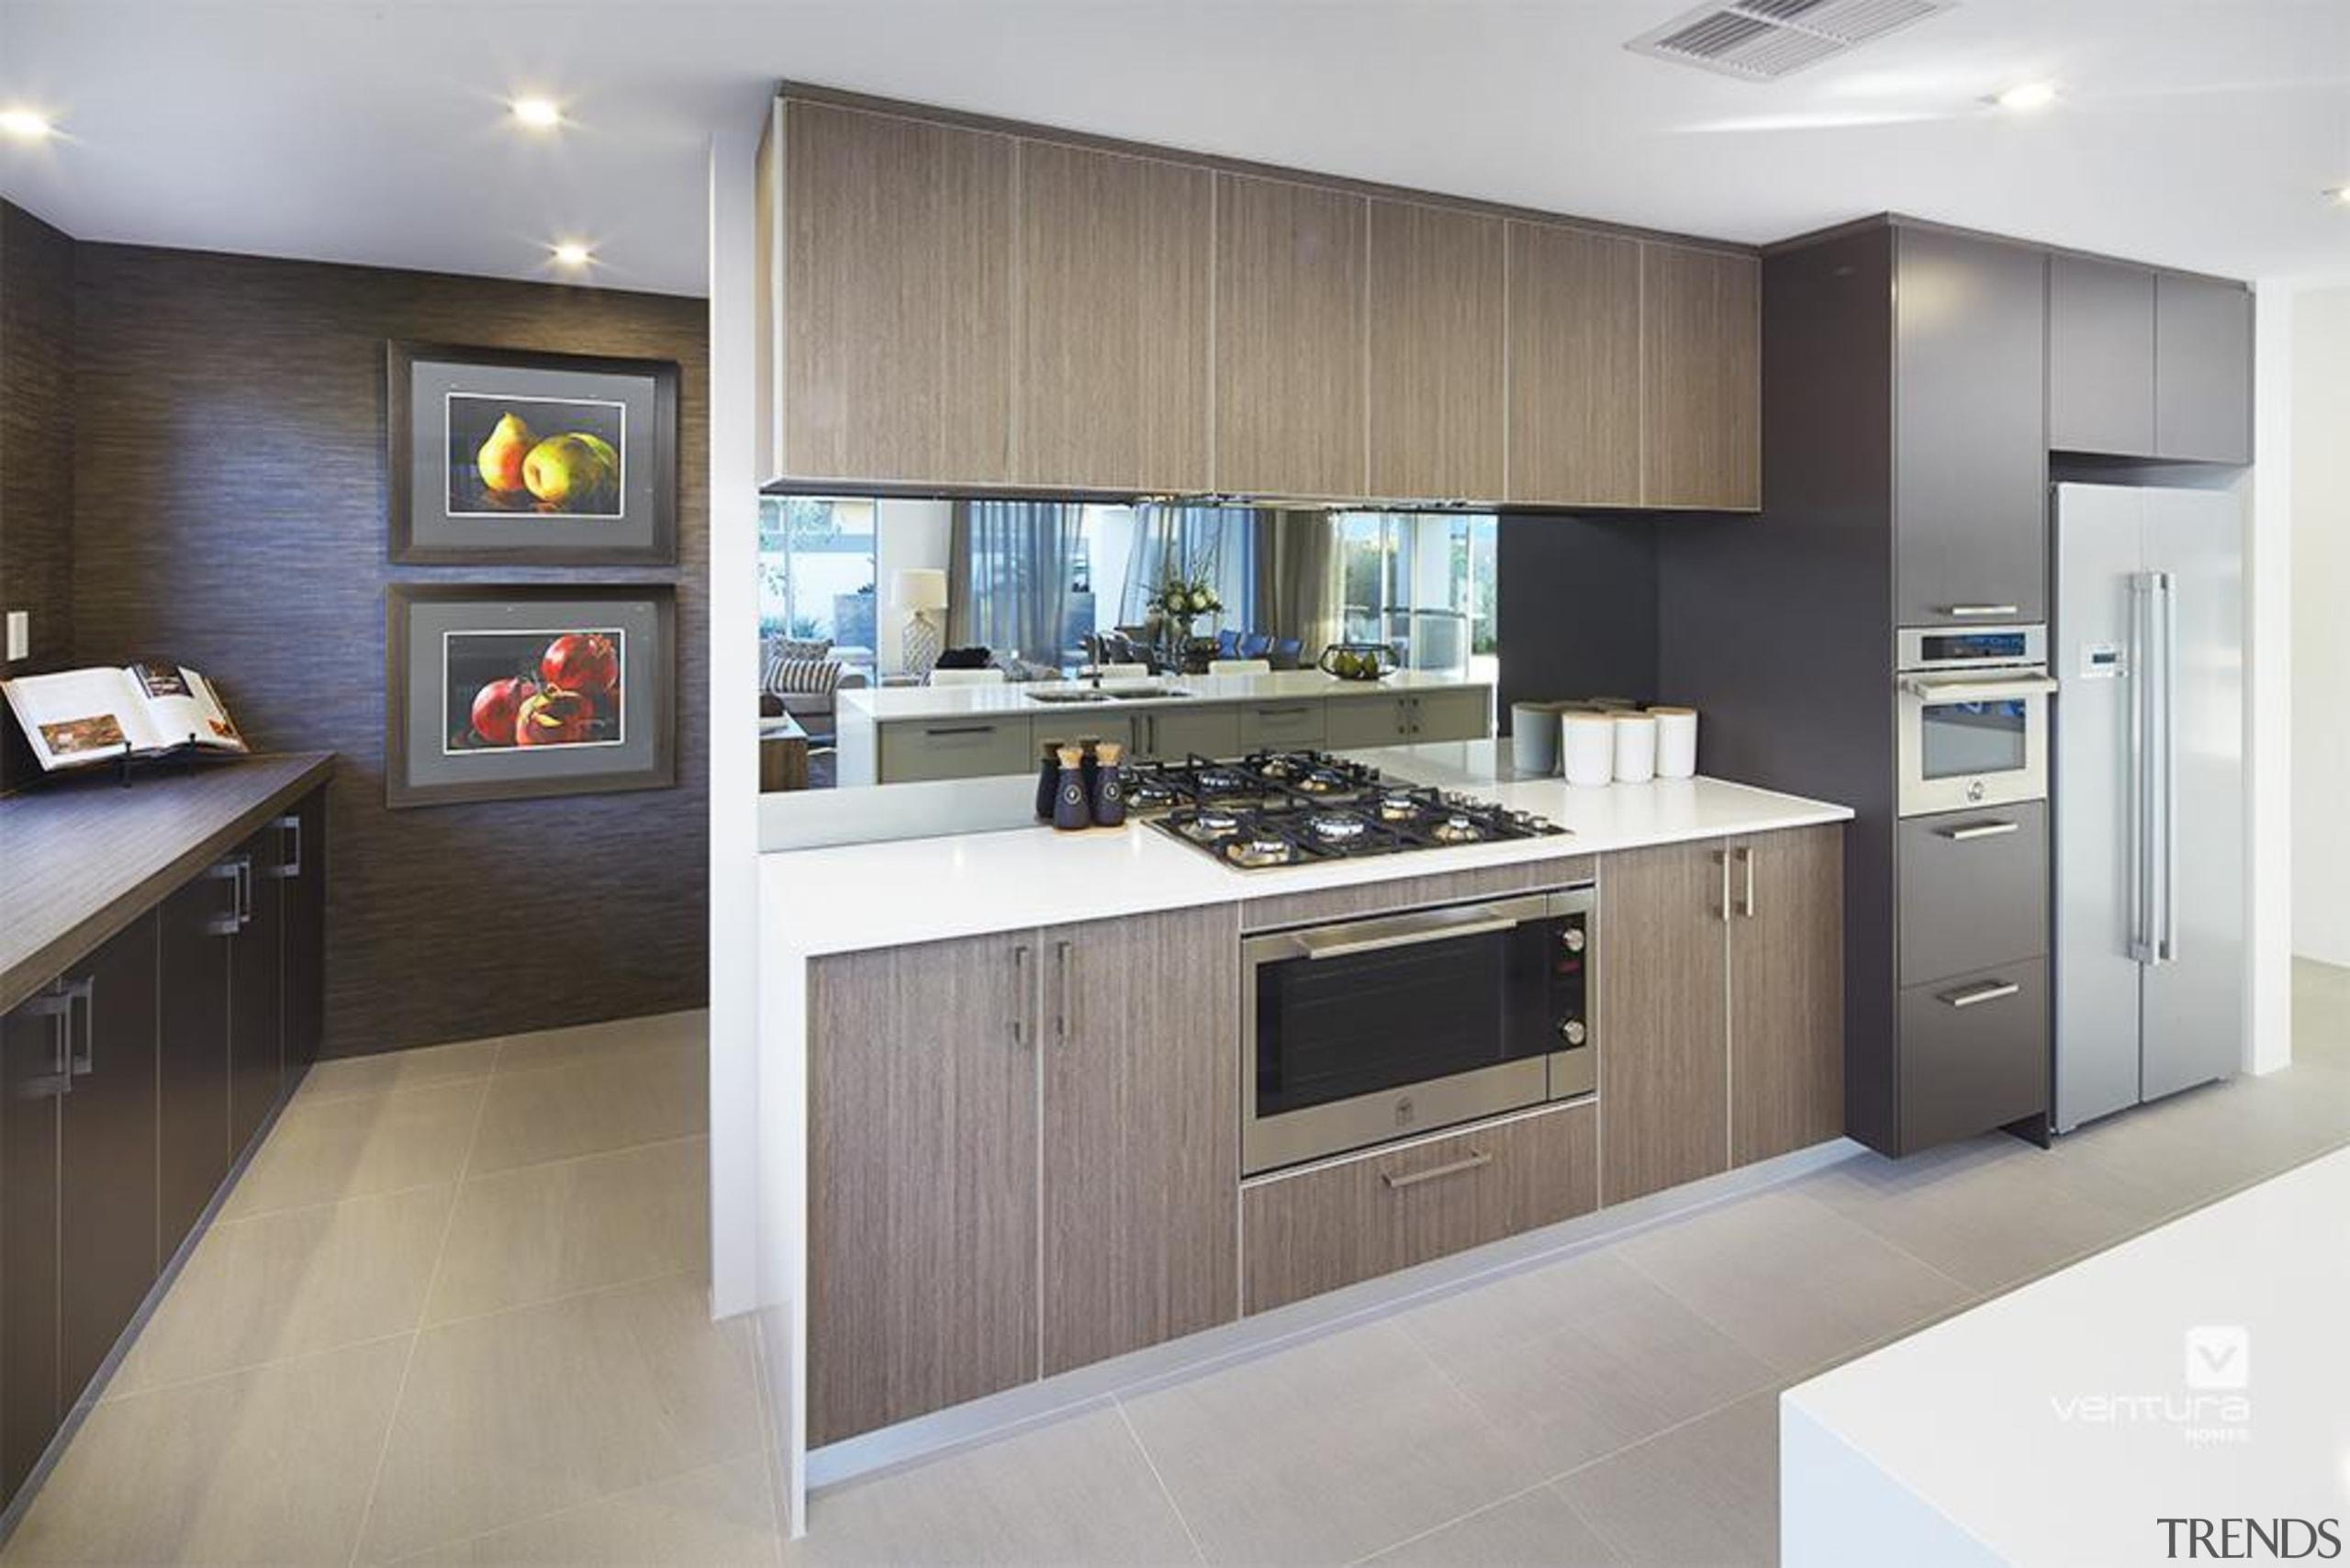 Kitchen design. - The Lexington Two Storey Display cabinetry, countertop, cuisine classique, interior design, kitchen, real estate, room, gray